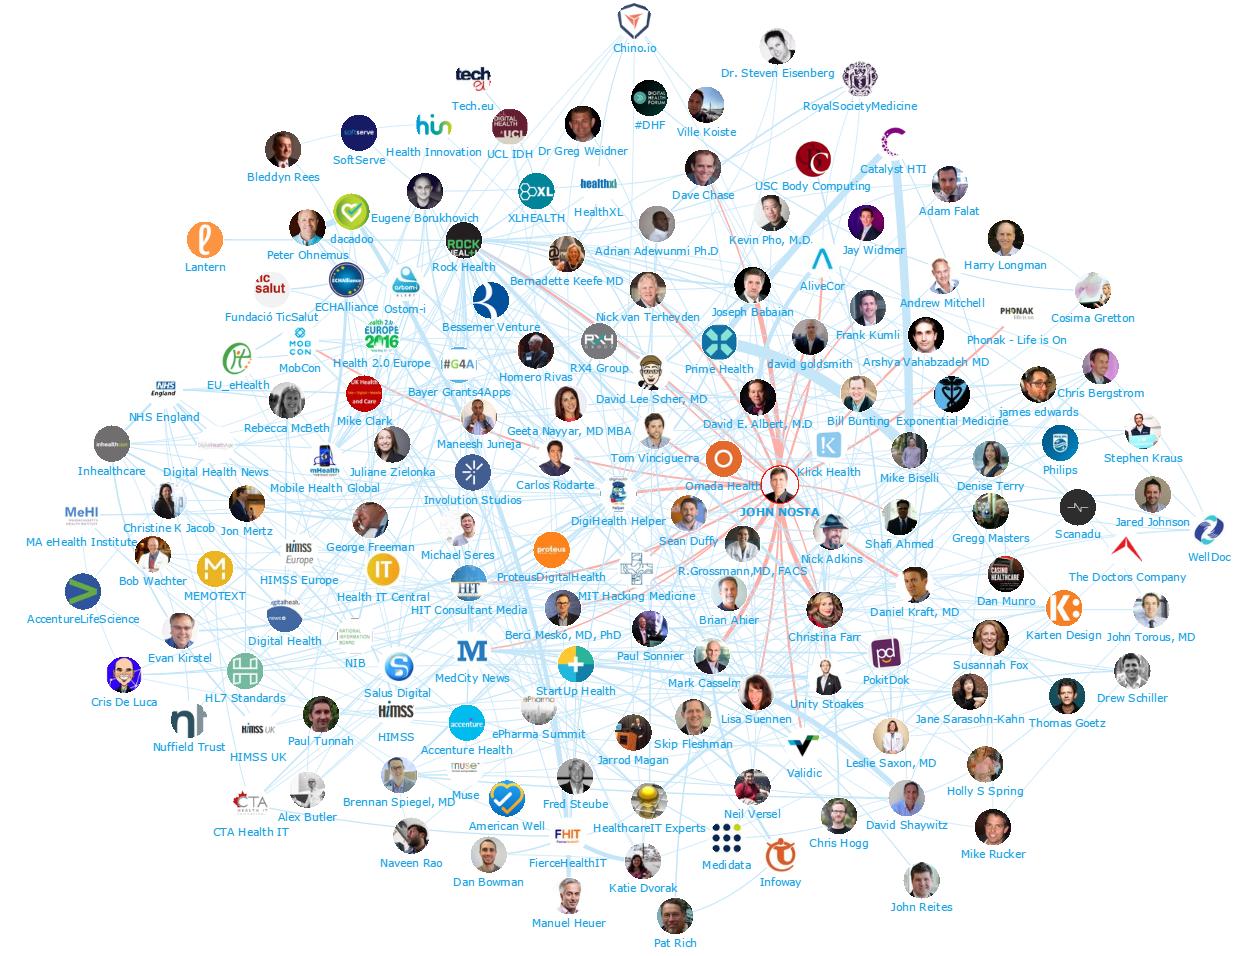 Onalytica - Digital Health 2016 Top 100 Influencers and Brands - John Nosta